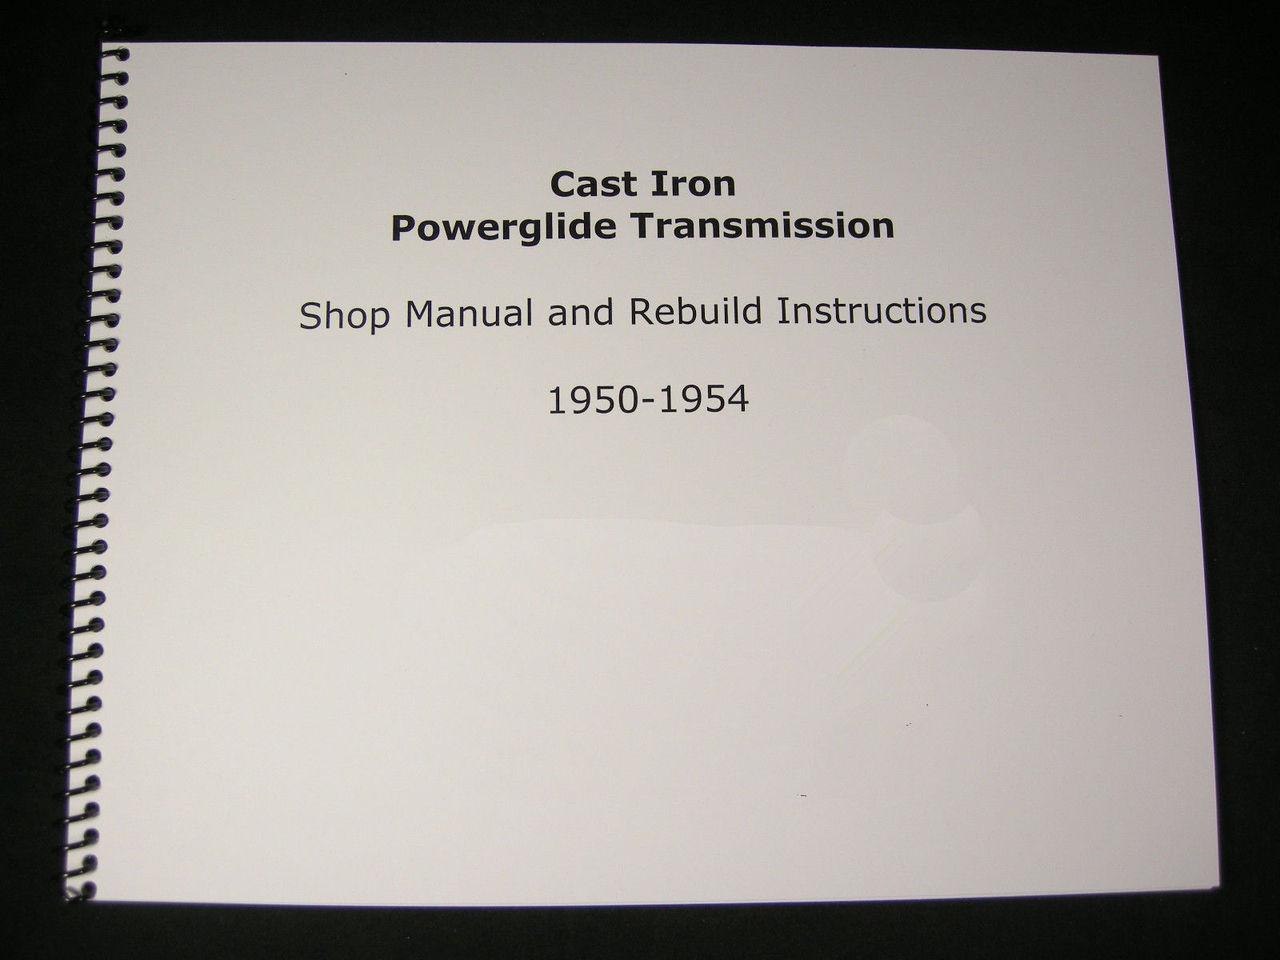 small resolution of 1950 1954 cast iron powerglide shop manual overhaul rebuild 4l80e transmission diagram 1950 1954 cast